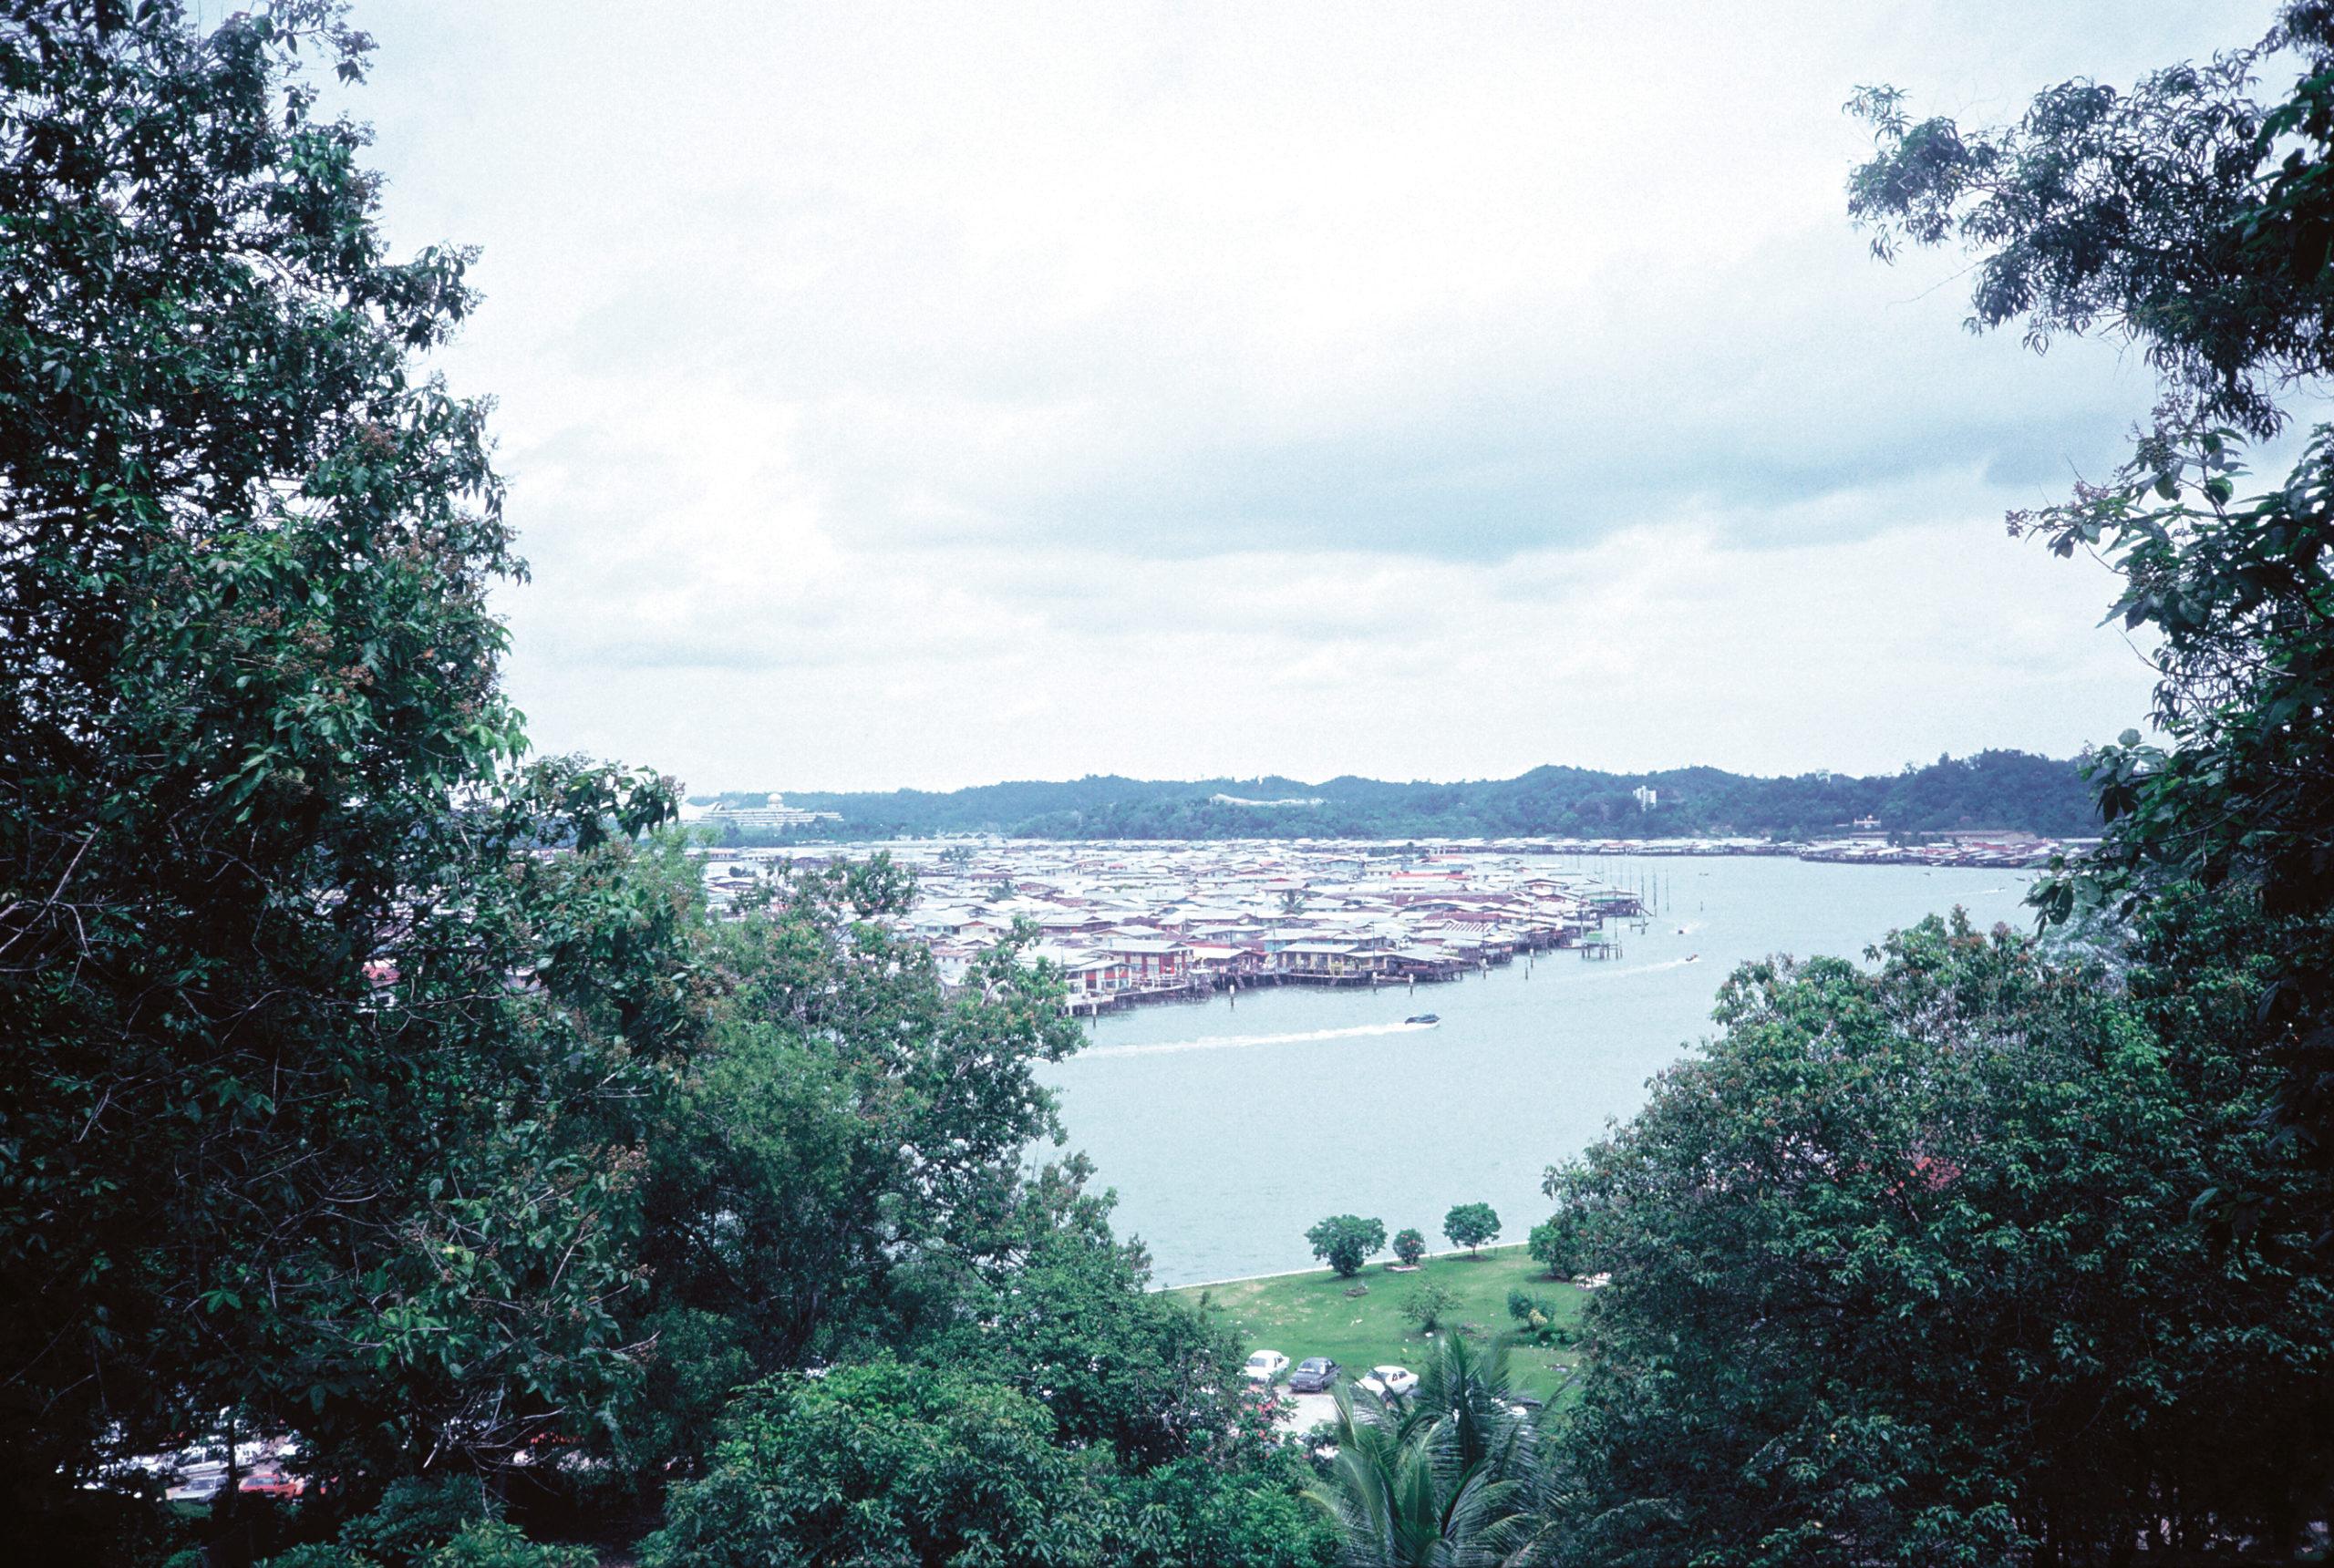 View looking over Bay of Brunei